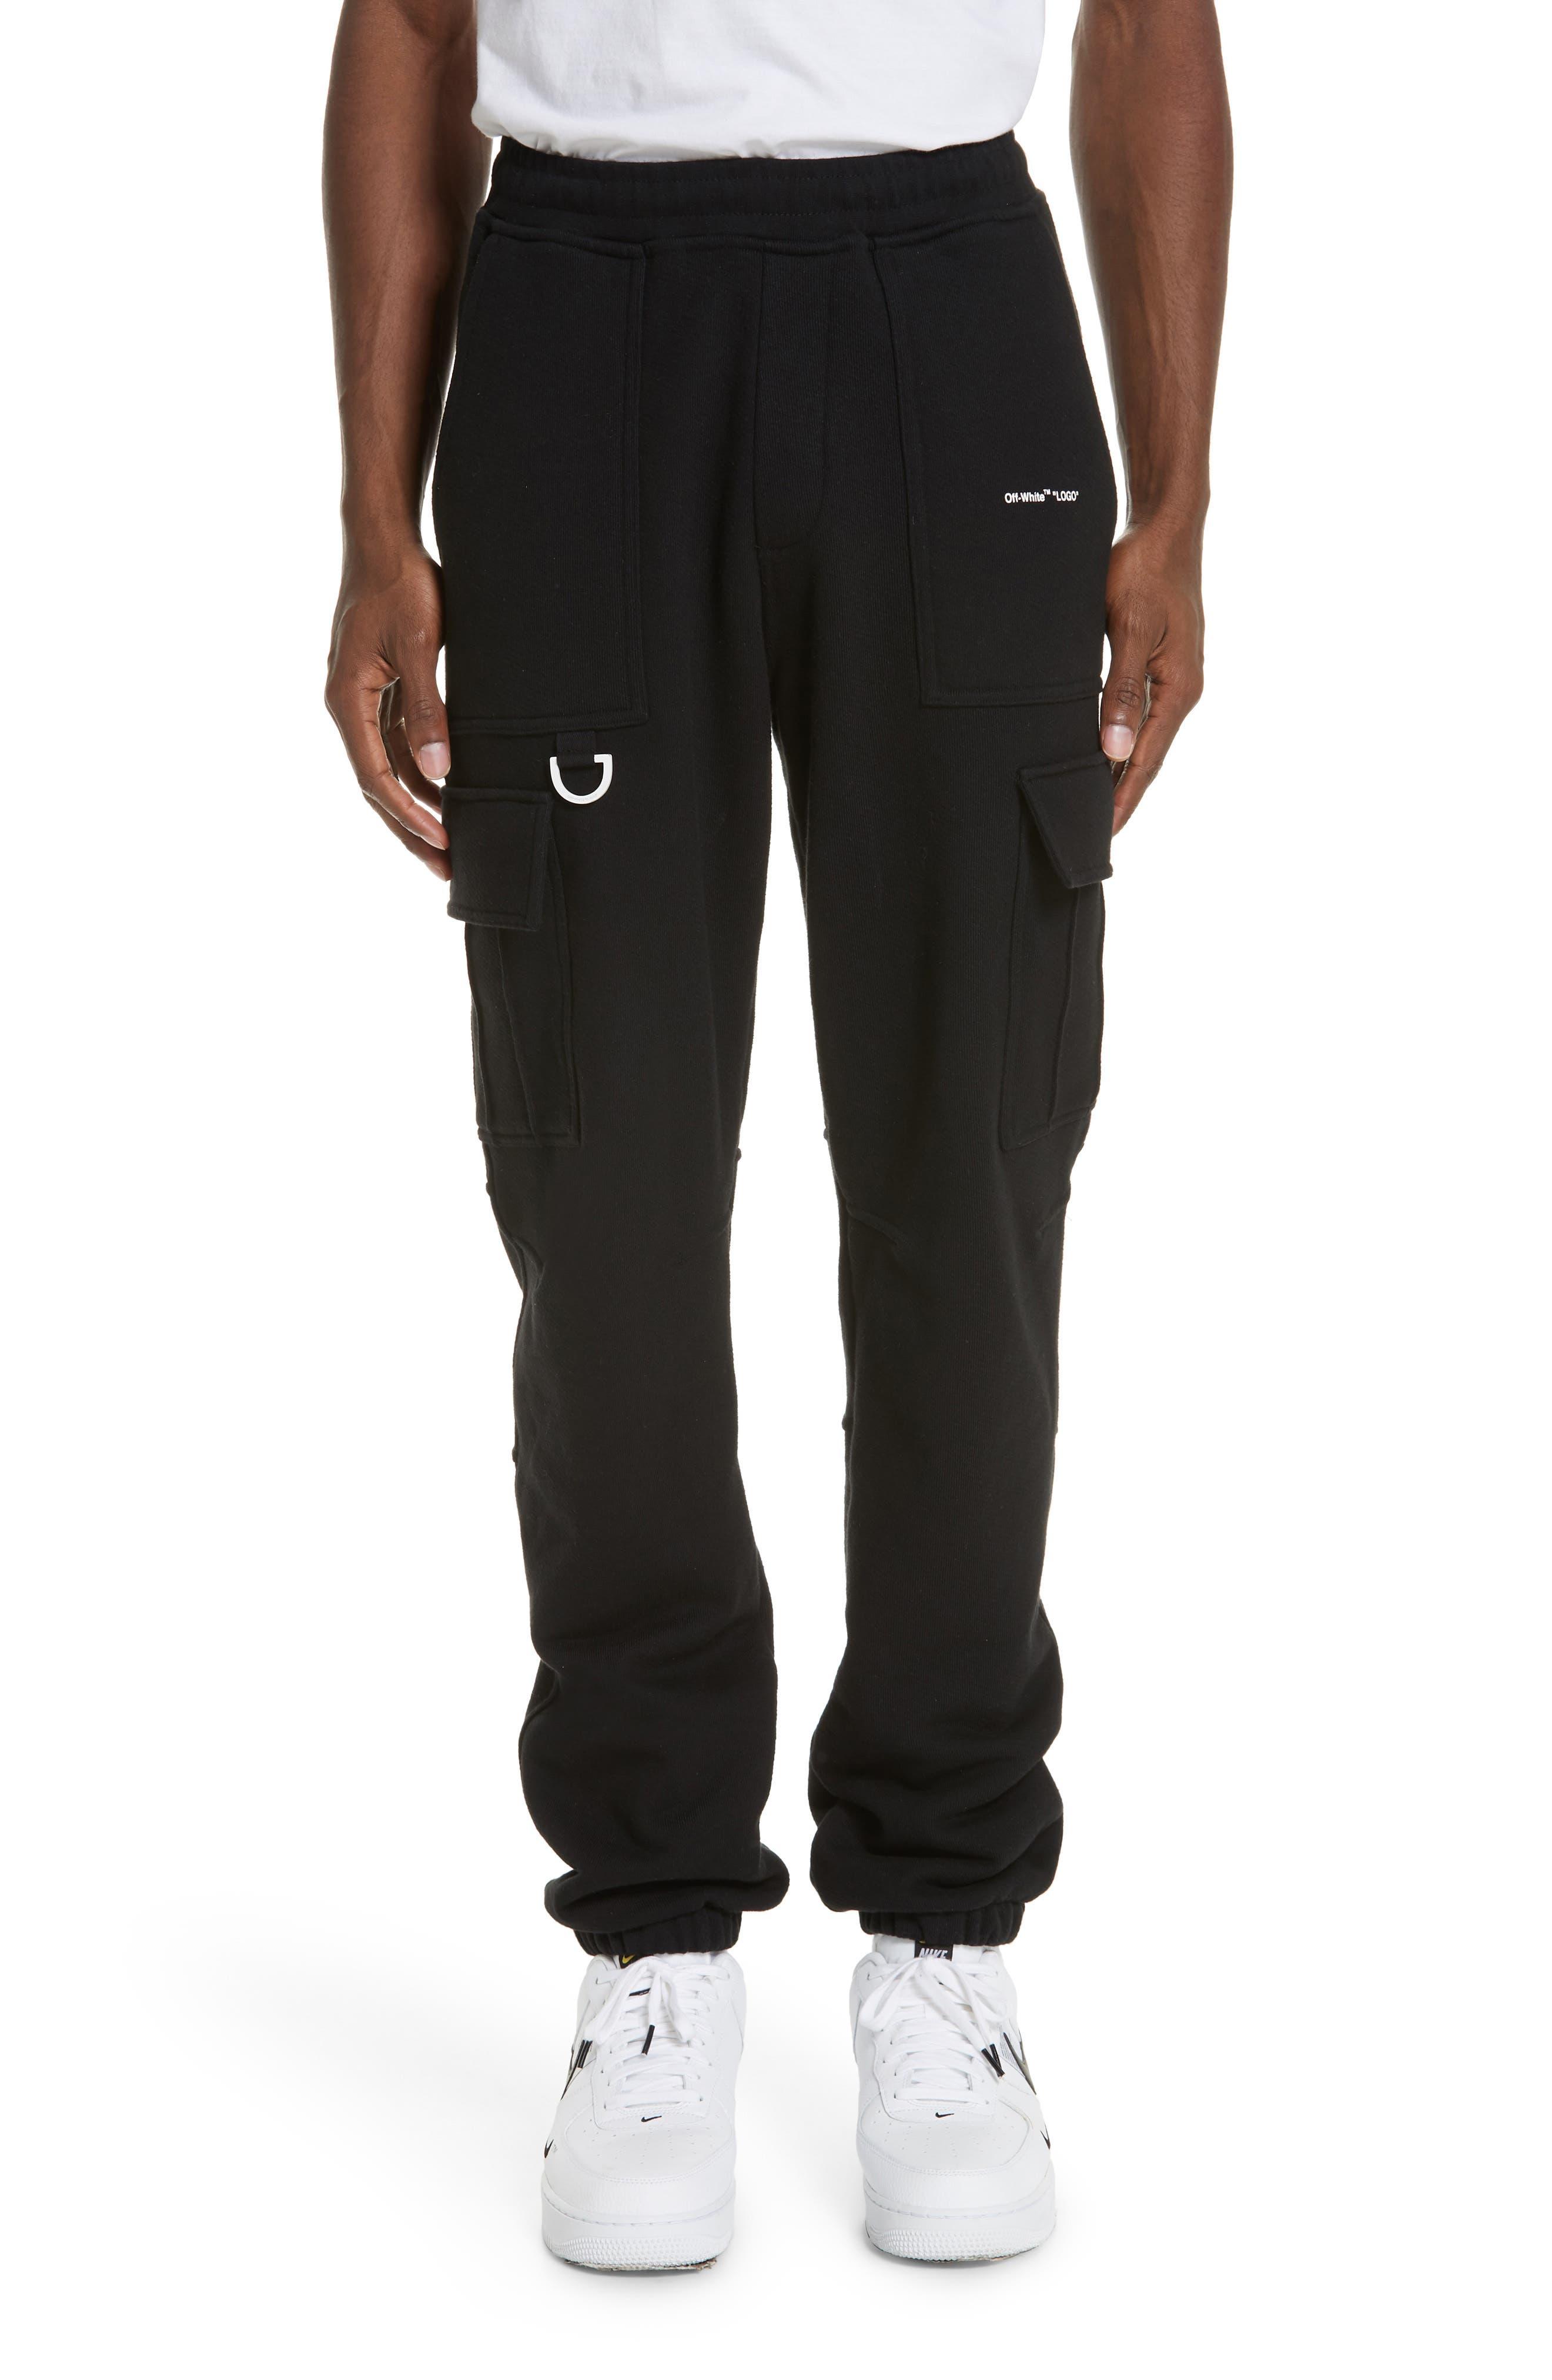 Off-White Cargo Jogger Pants, Black